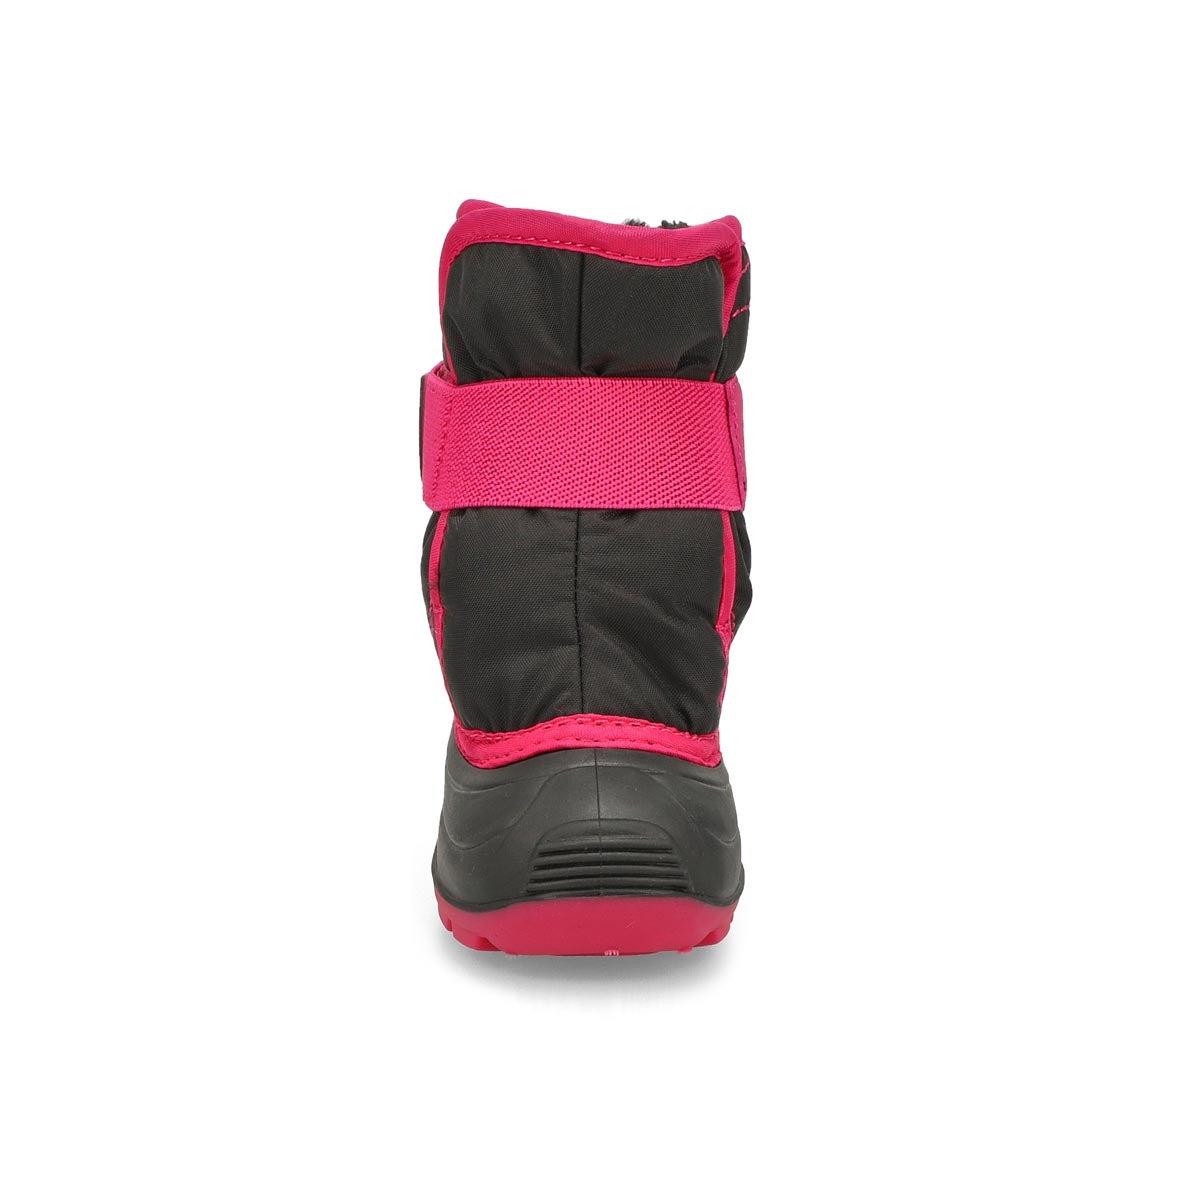 Toddlers' SNOWBUG 3 blk/mgta wtrpf winter boots